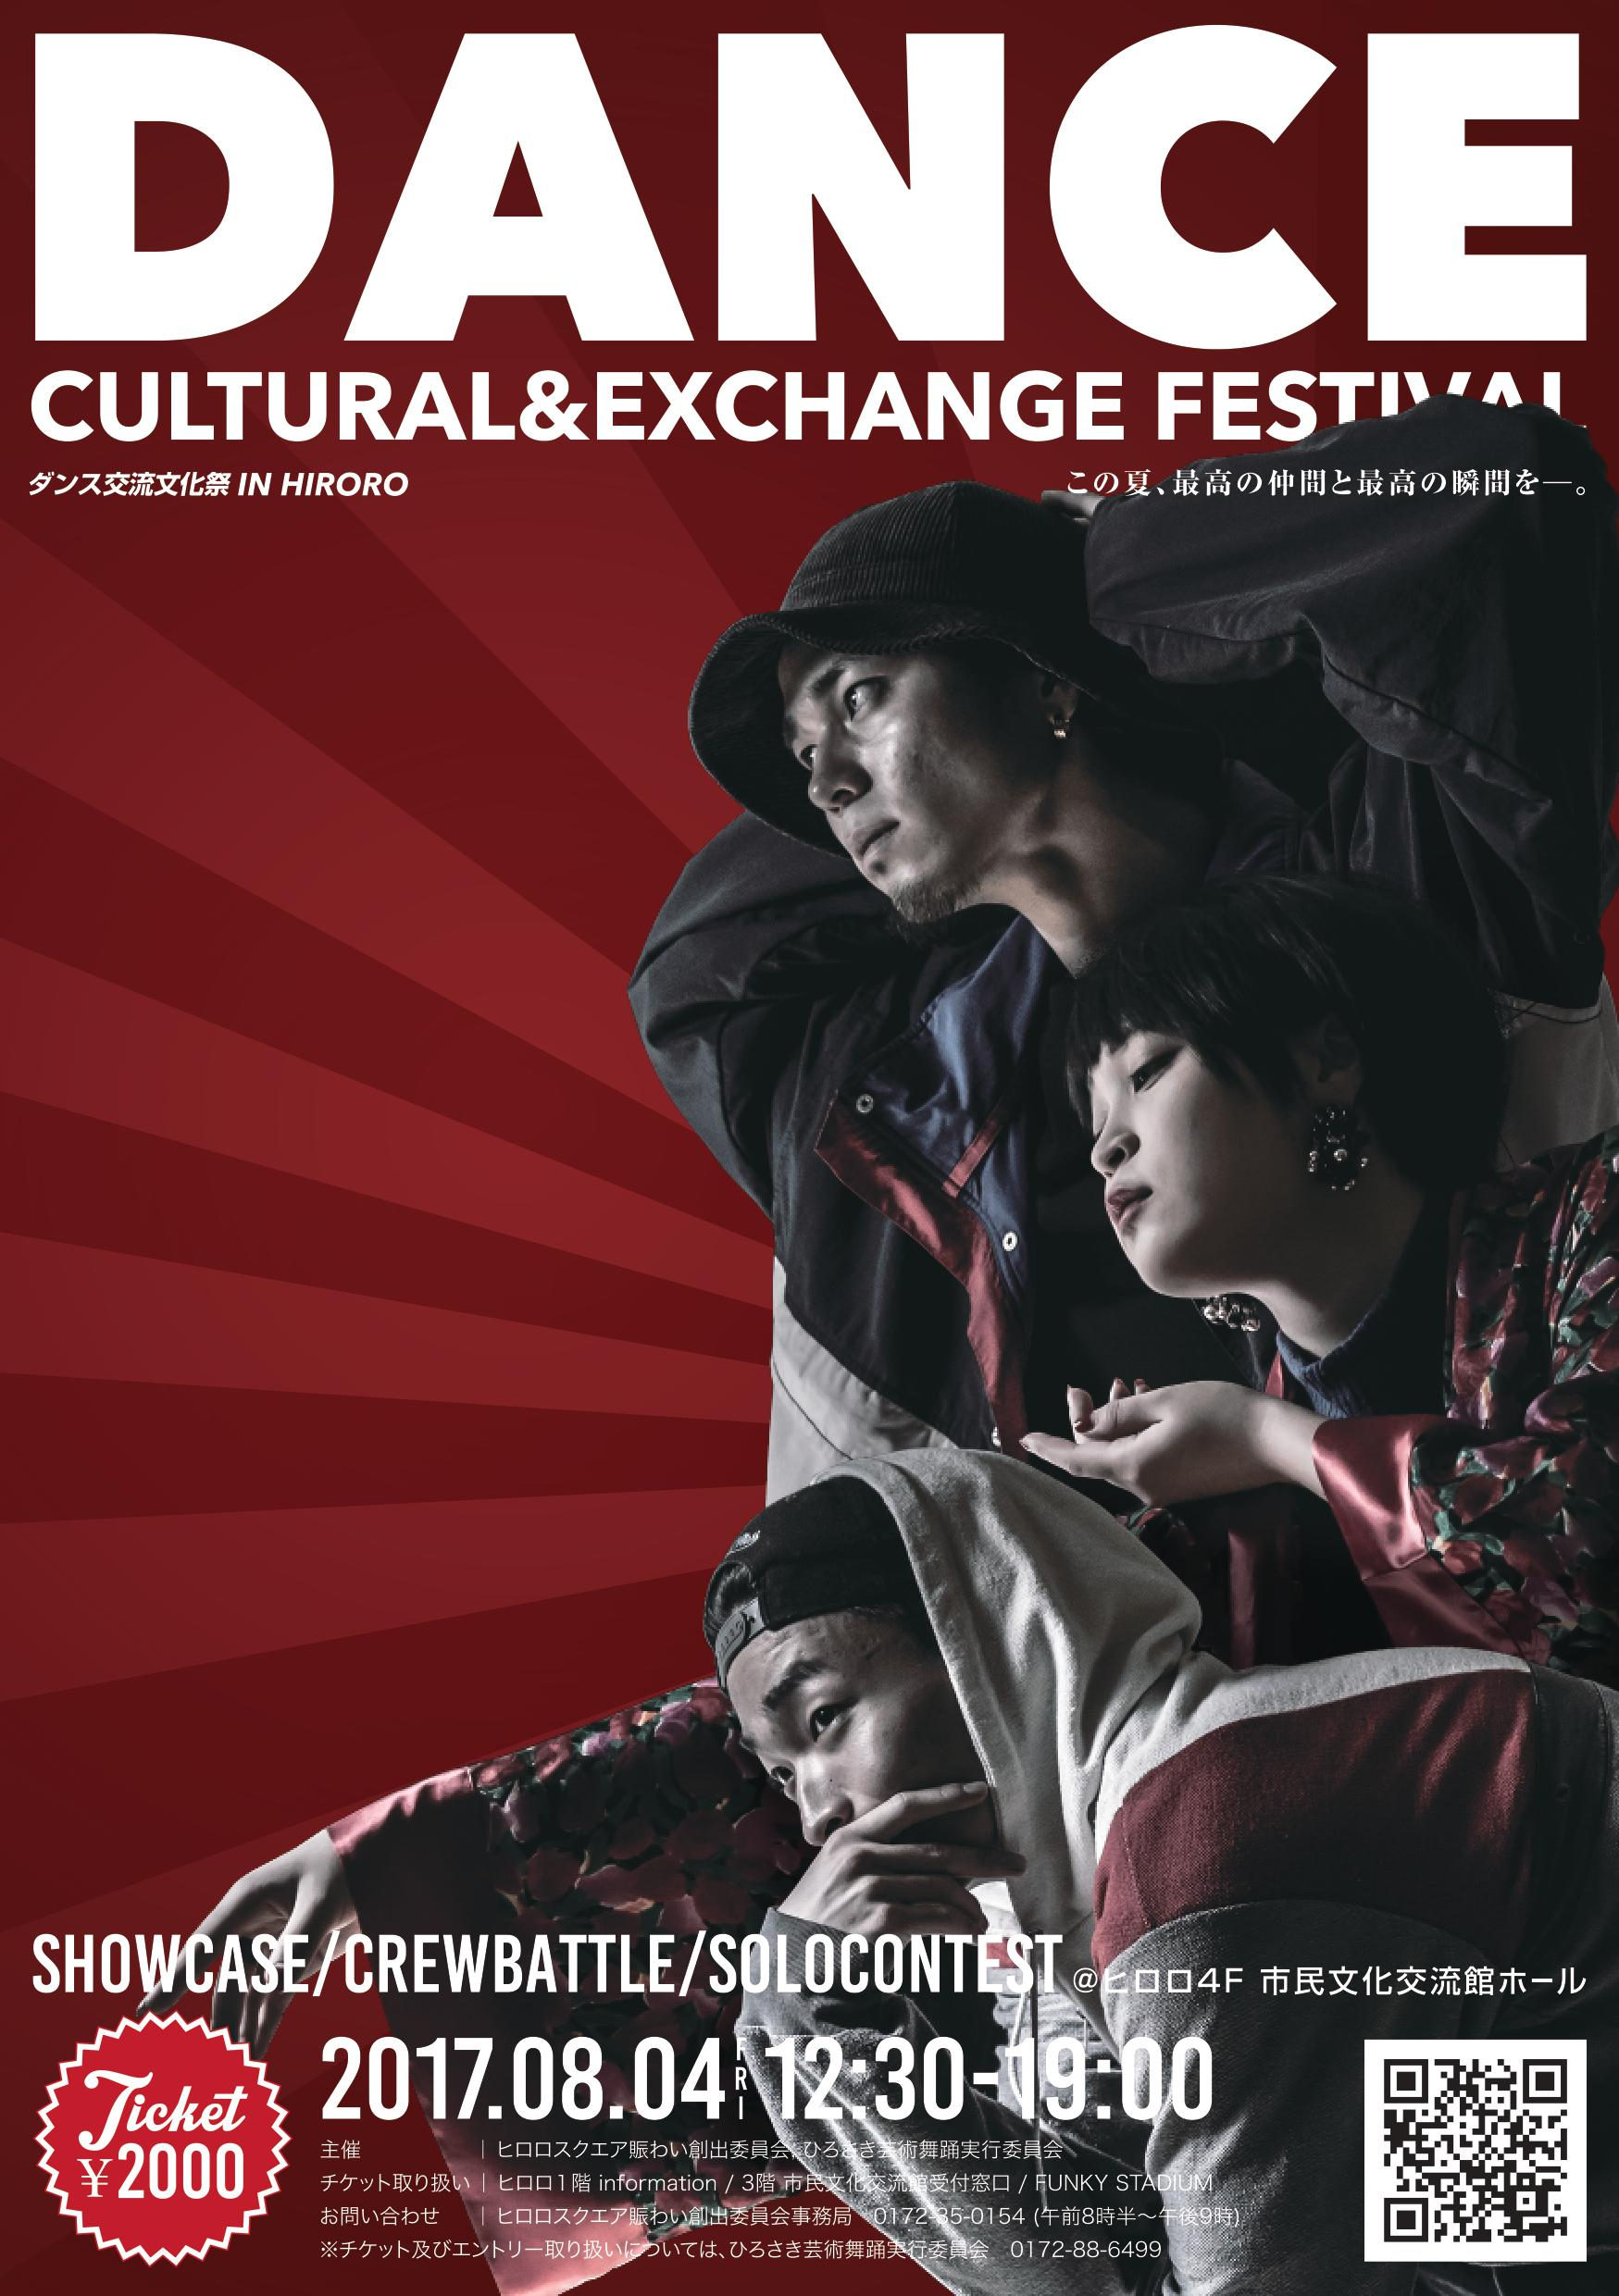 DANCE交流文化祭2017チラシ